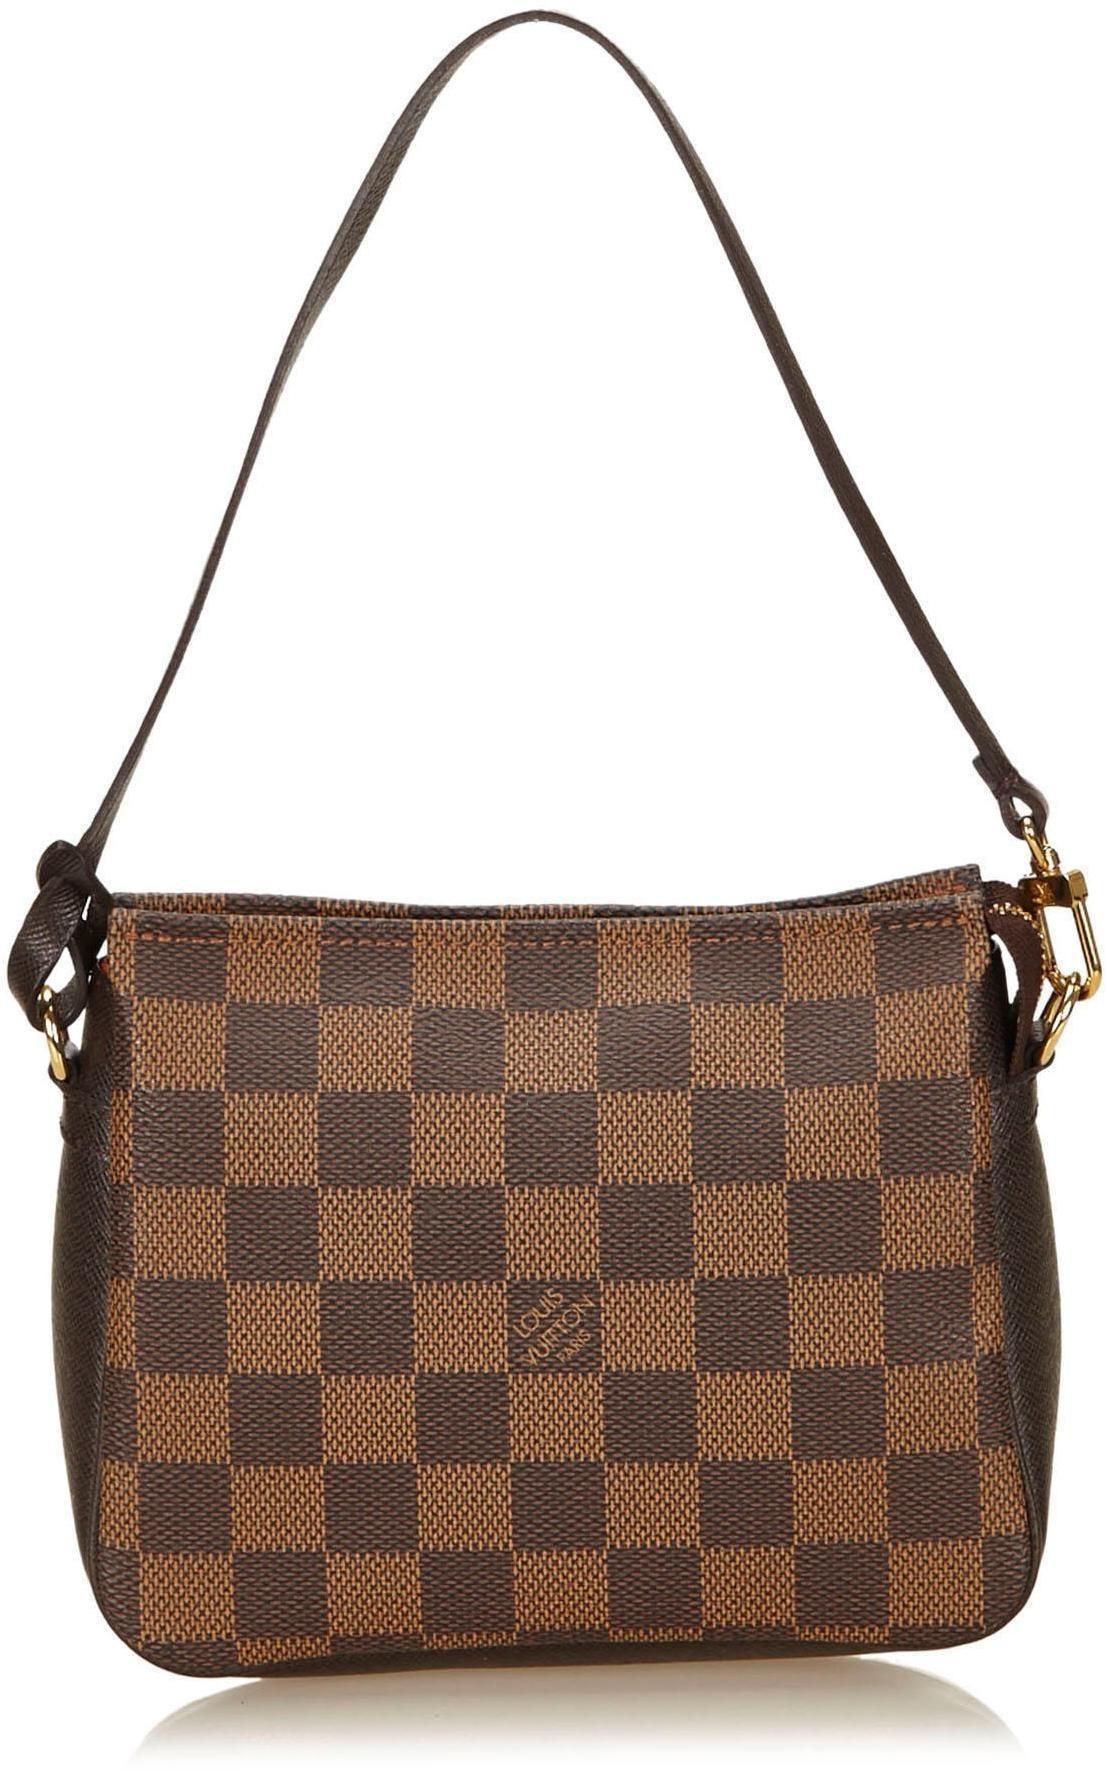 Louis Vuitton Trousse Pochette Damier Ebene Brown